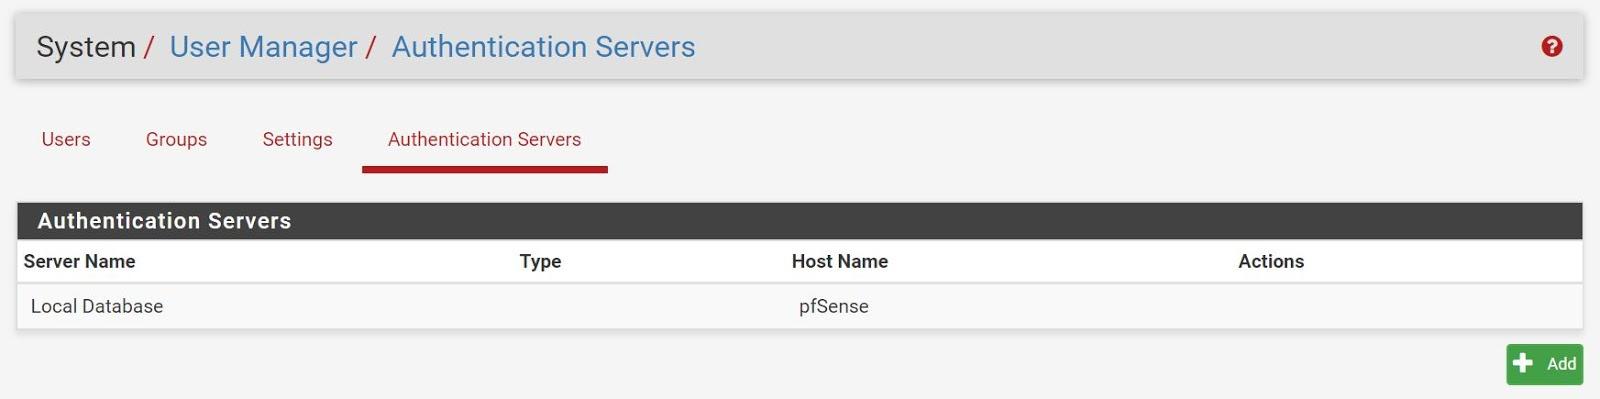 pfSense OpenVPN Setup with FreeRadius3 2fa Authentication: Part 2